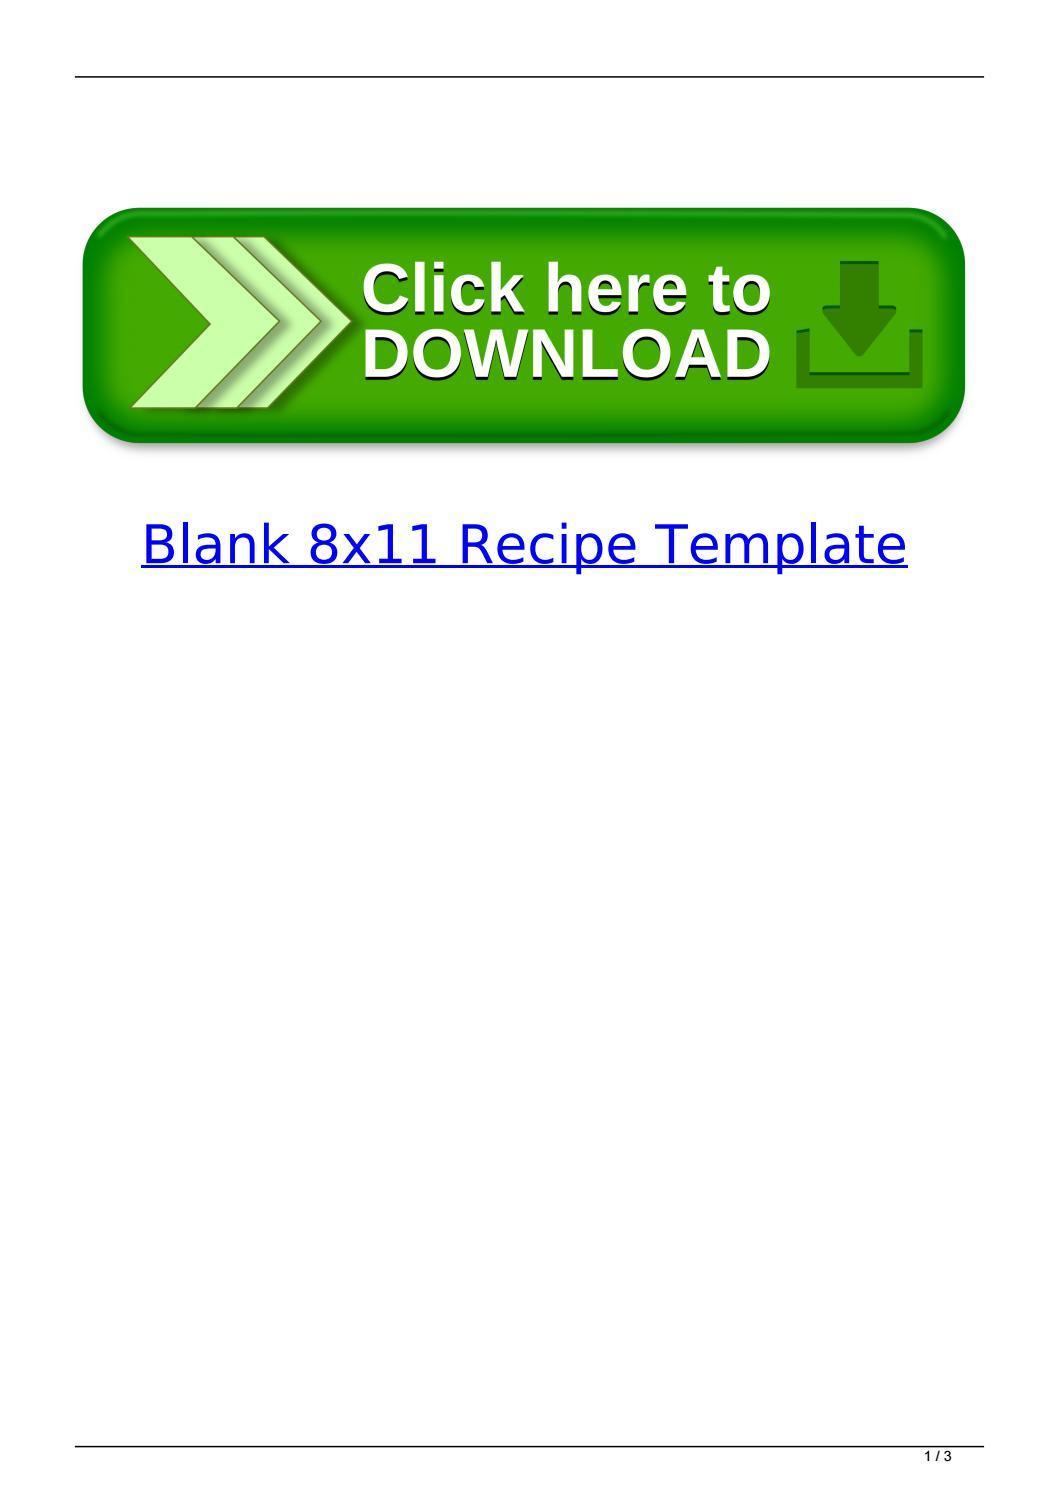 Blank Recipe Template 8×11